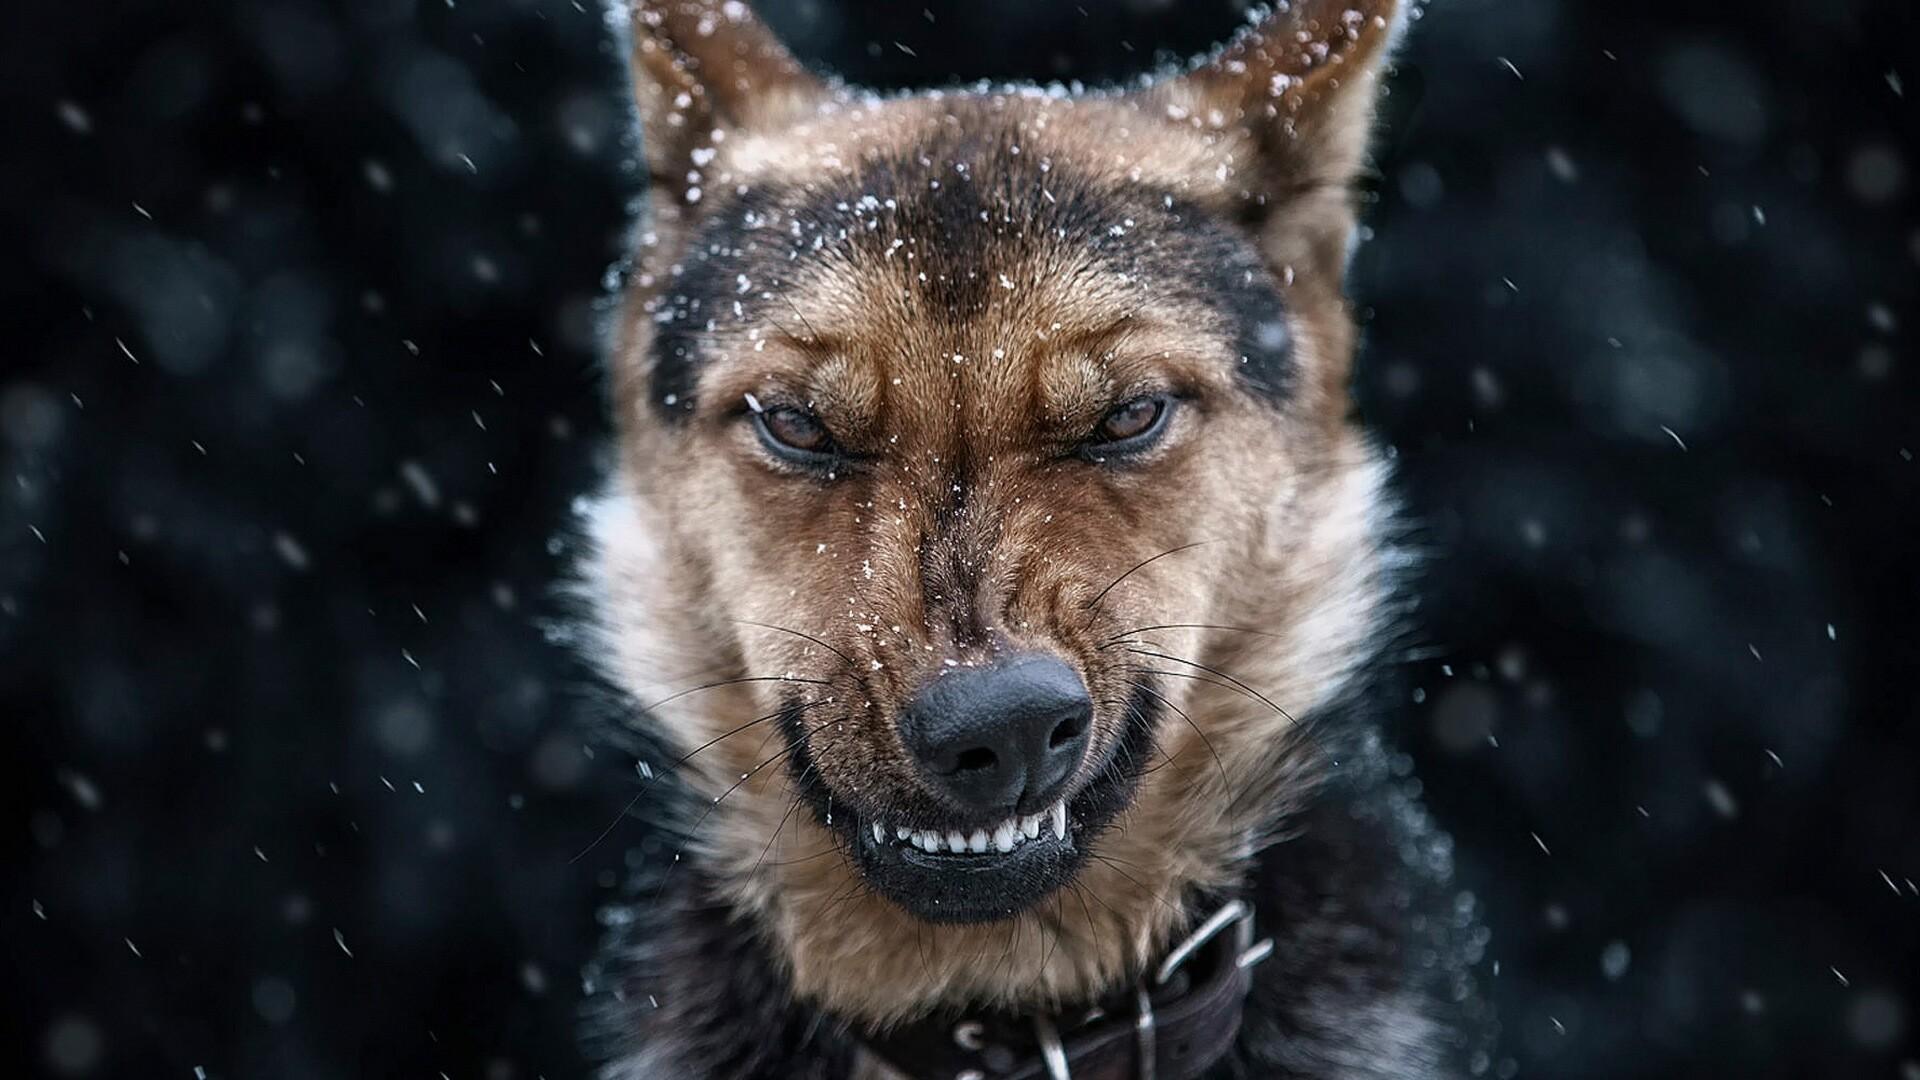 Angry German Shepherd Dog Wallpaper   Wallpaper Studio 10   Tens of ...